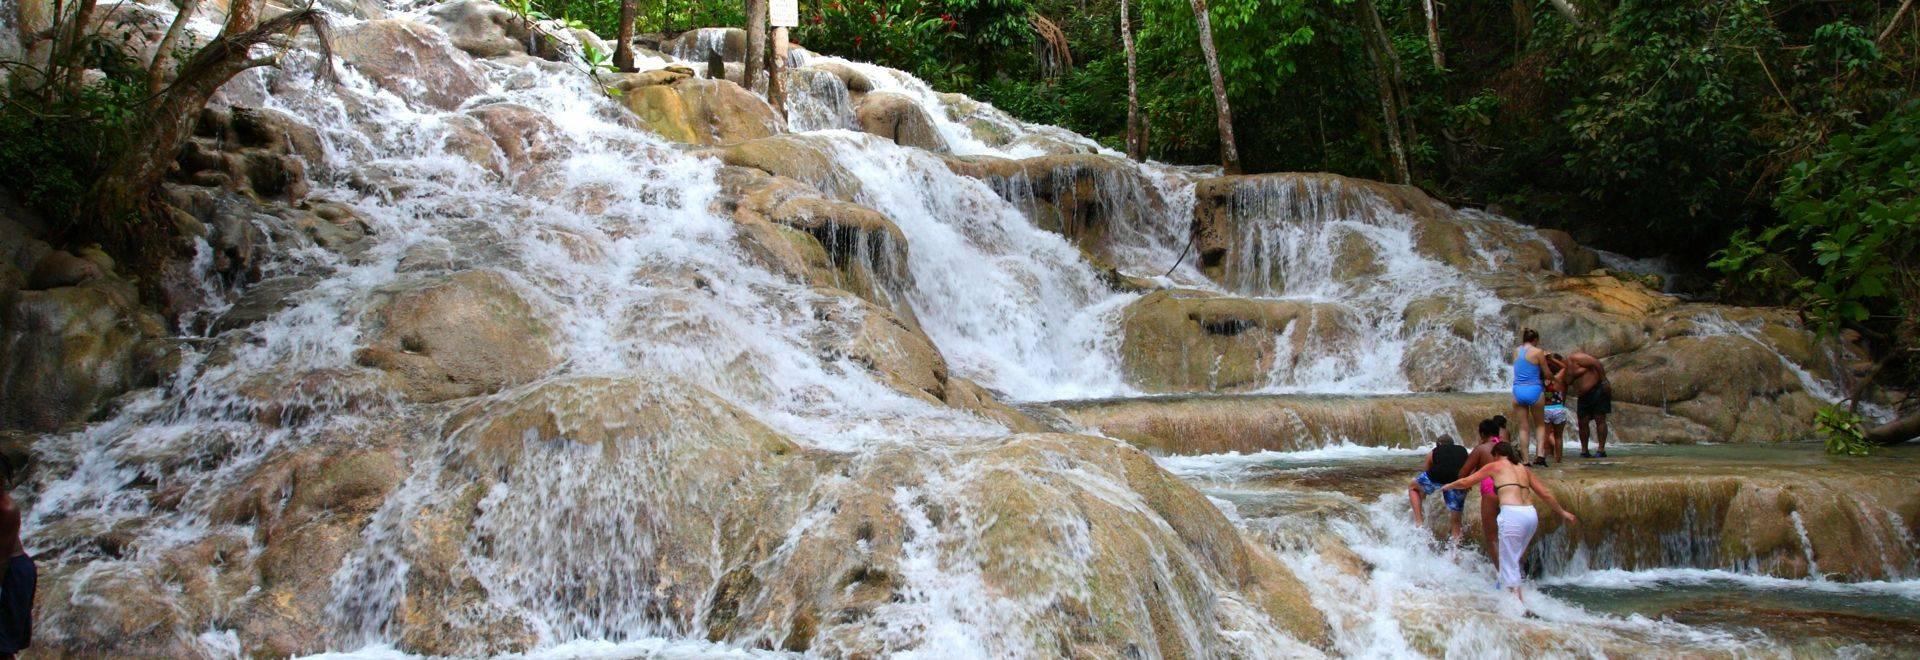 shutterstock_145813424 Dunn's River, Jamaica.jpg